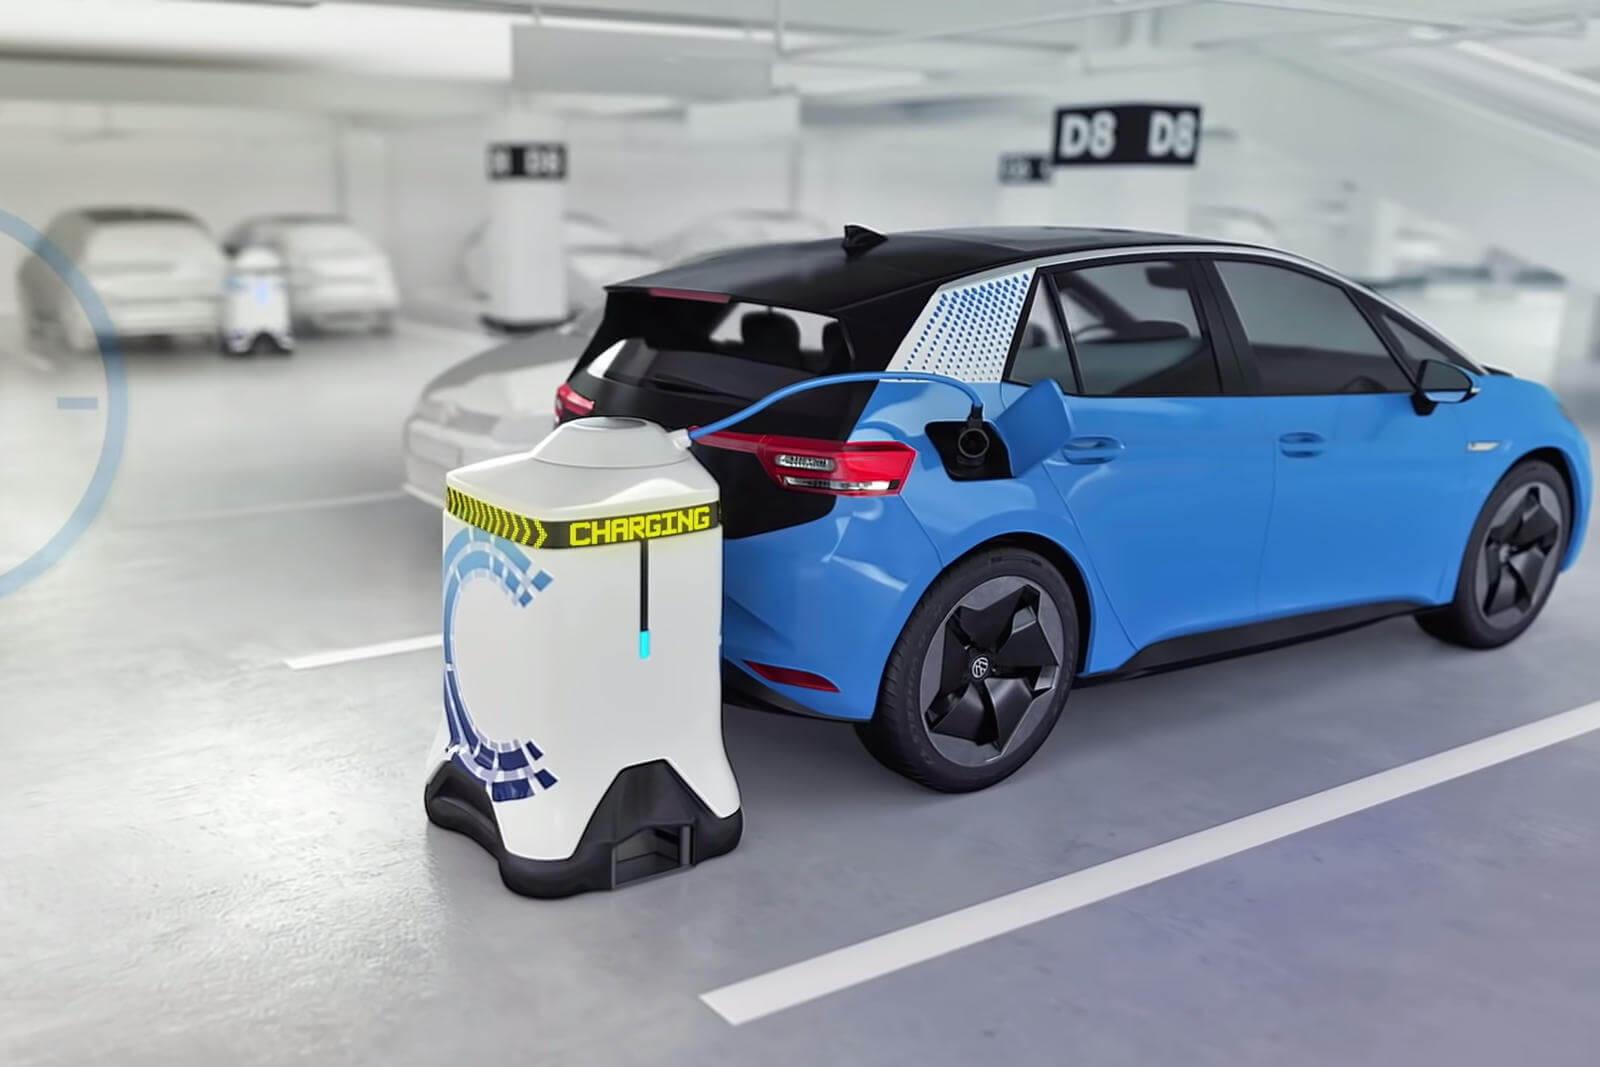 Elektrikli Araba Şarj Robotu